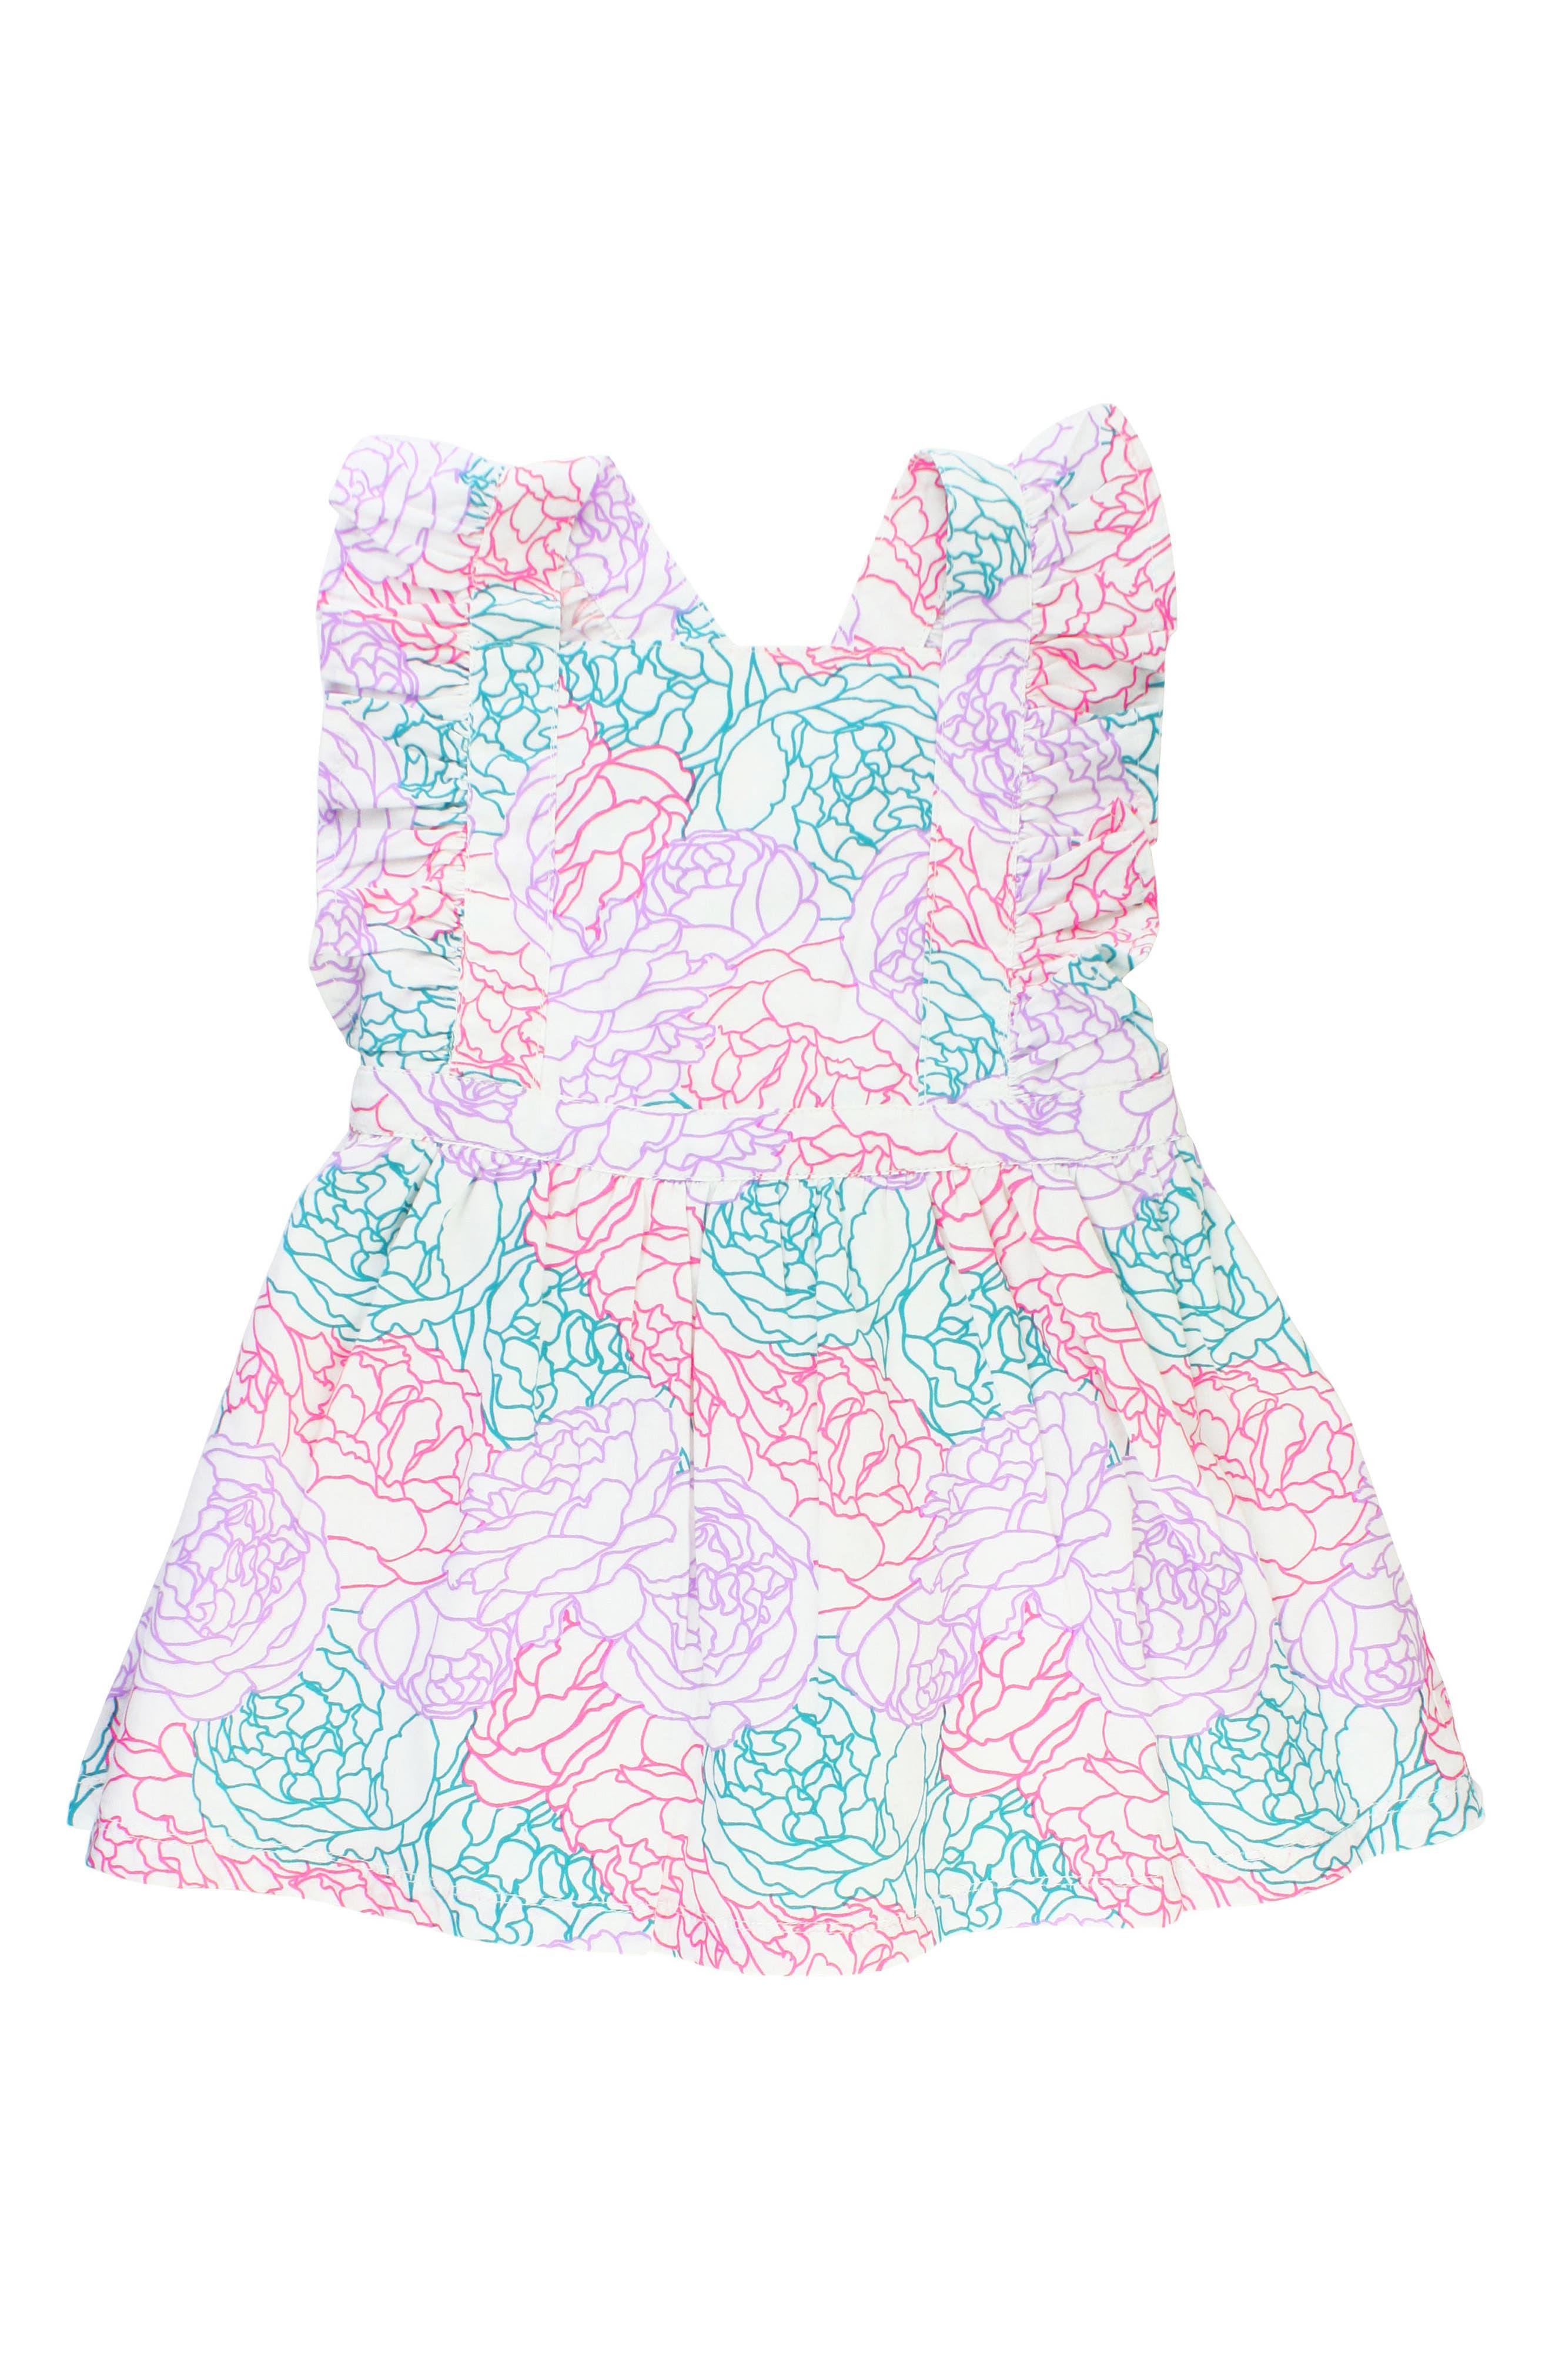 Peony Party Dress,                             Main thumbnail 1, color,                             White